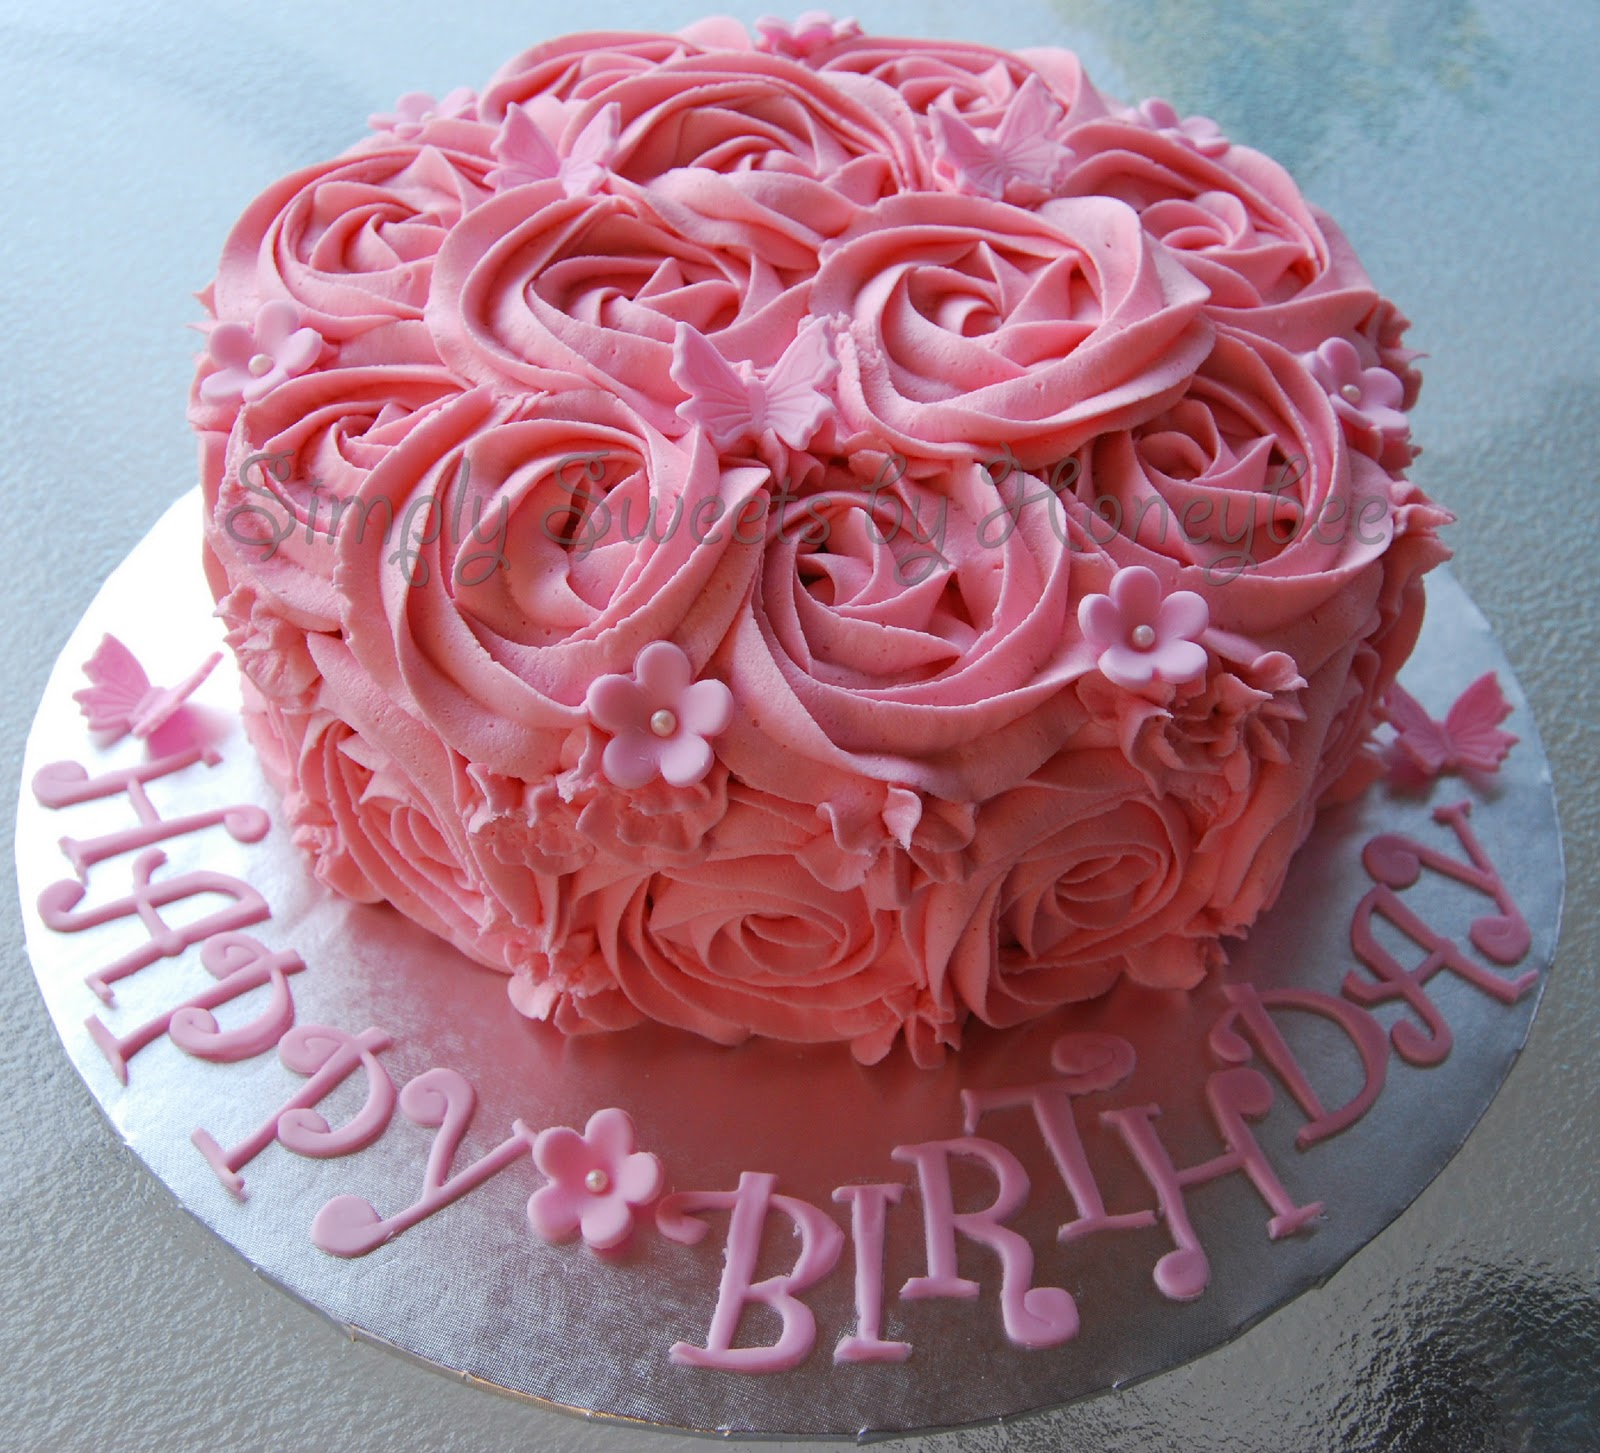 Two Birthday Cakes Simplysweetsbyhoneybee